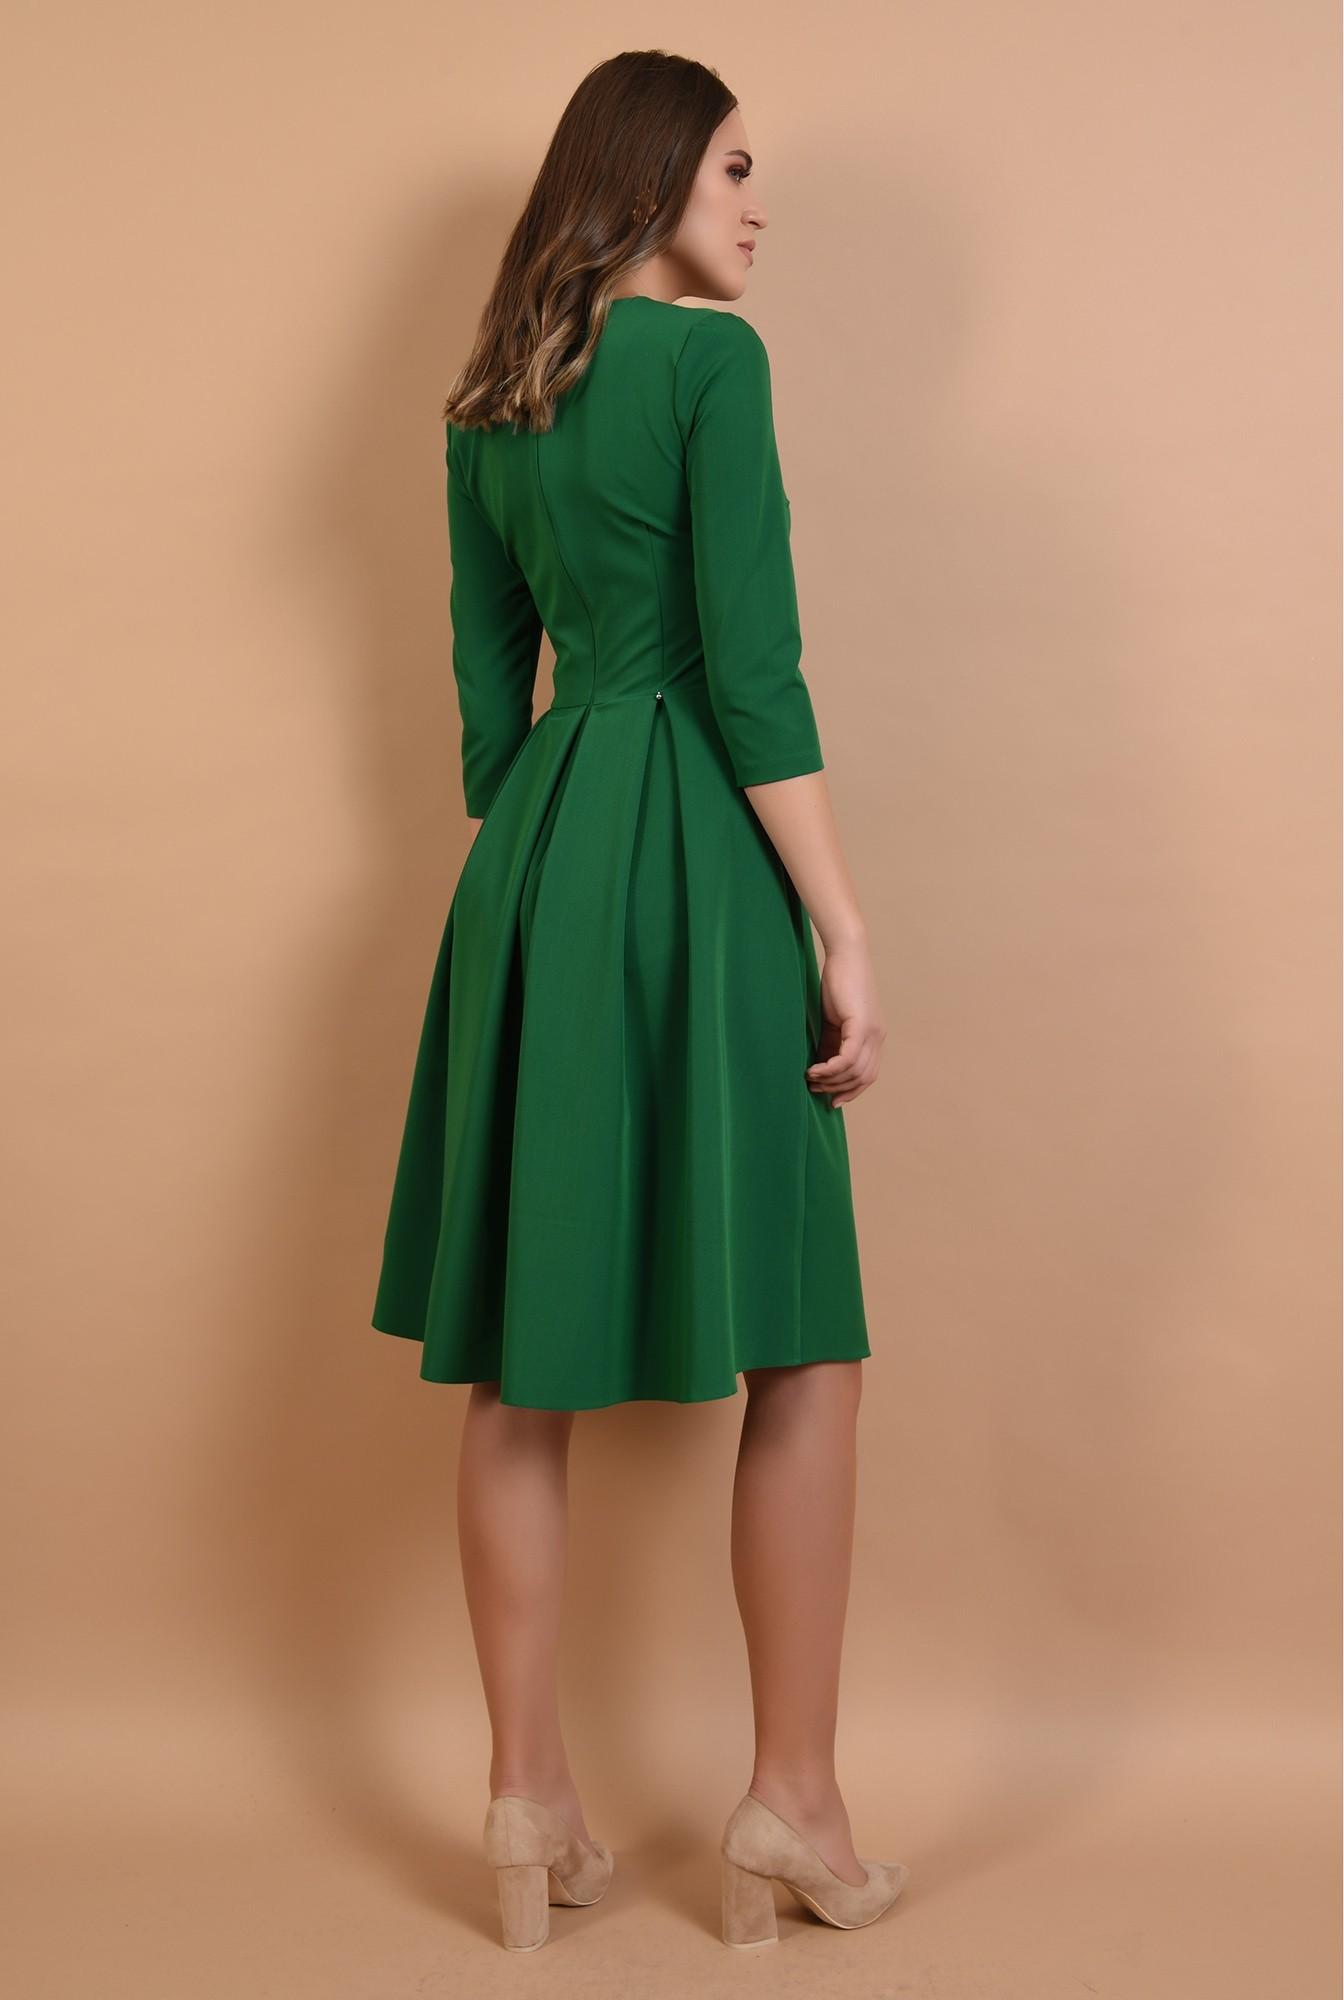 1 - rochie midi, evazata, verde, cu pliseuri, fenta la decolteu, Poema